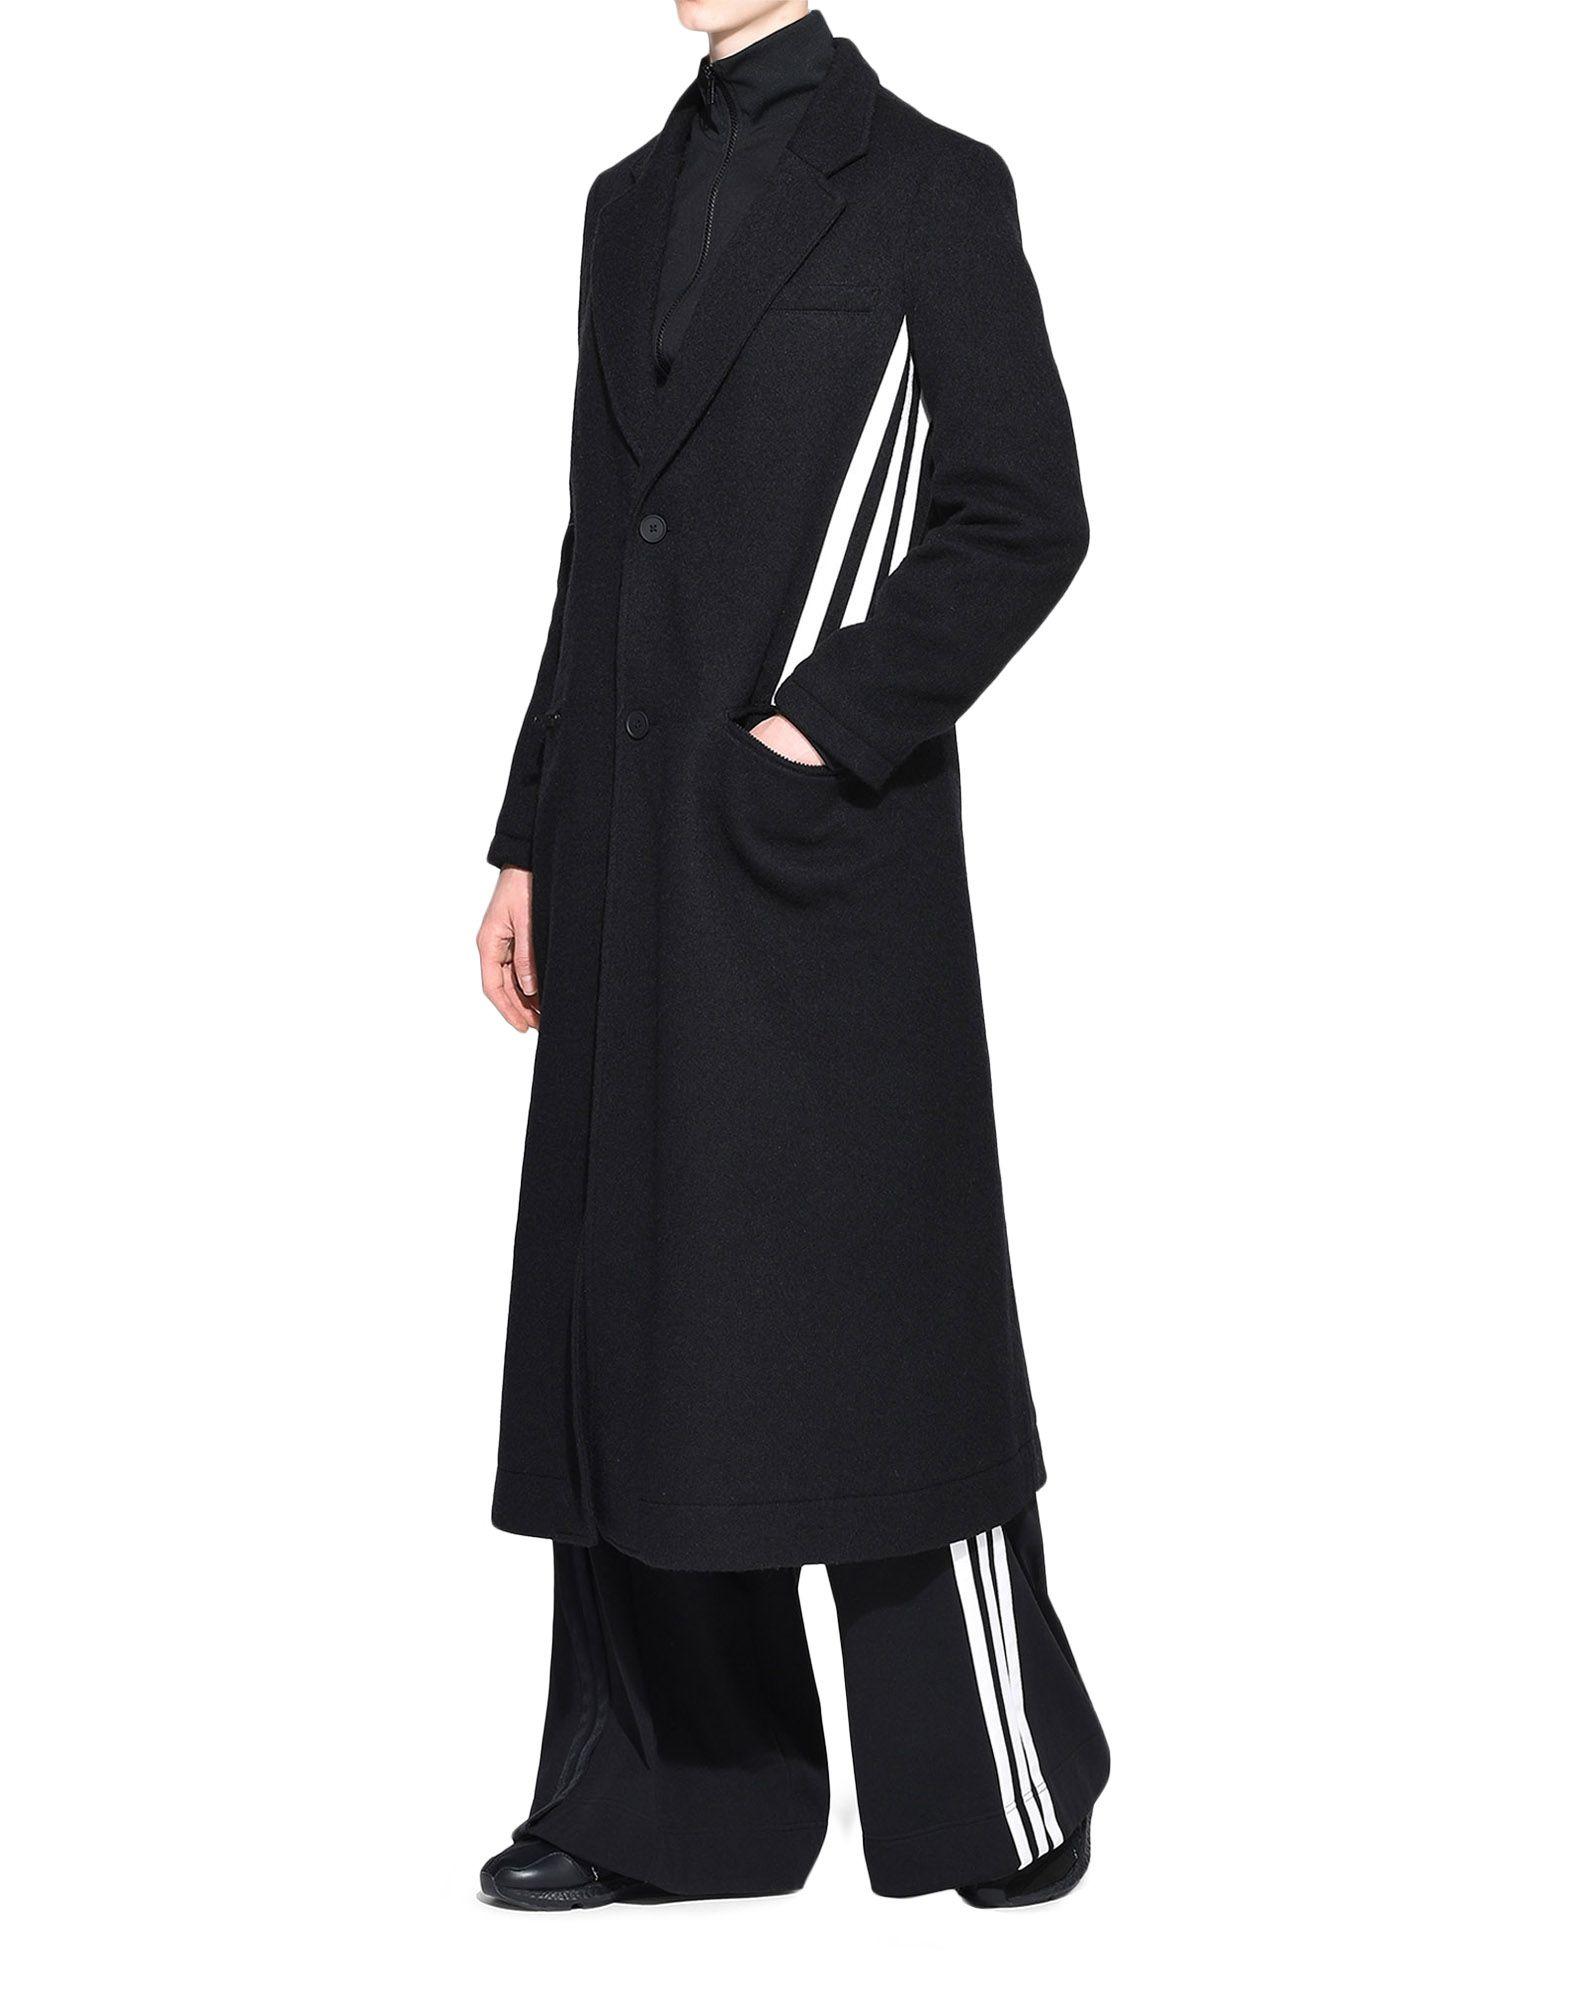 Y-3 Y-3 3-Stripes Tailored Wool Coat フォーマルジャケット レディース a